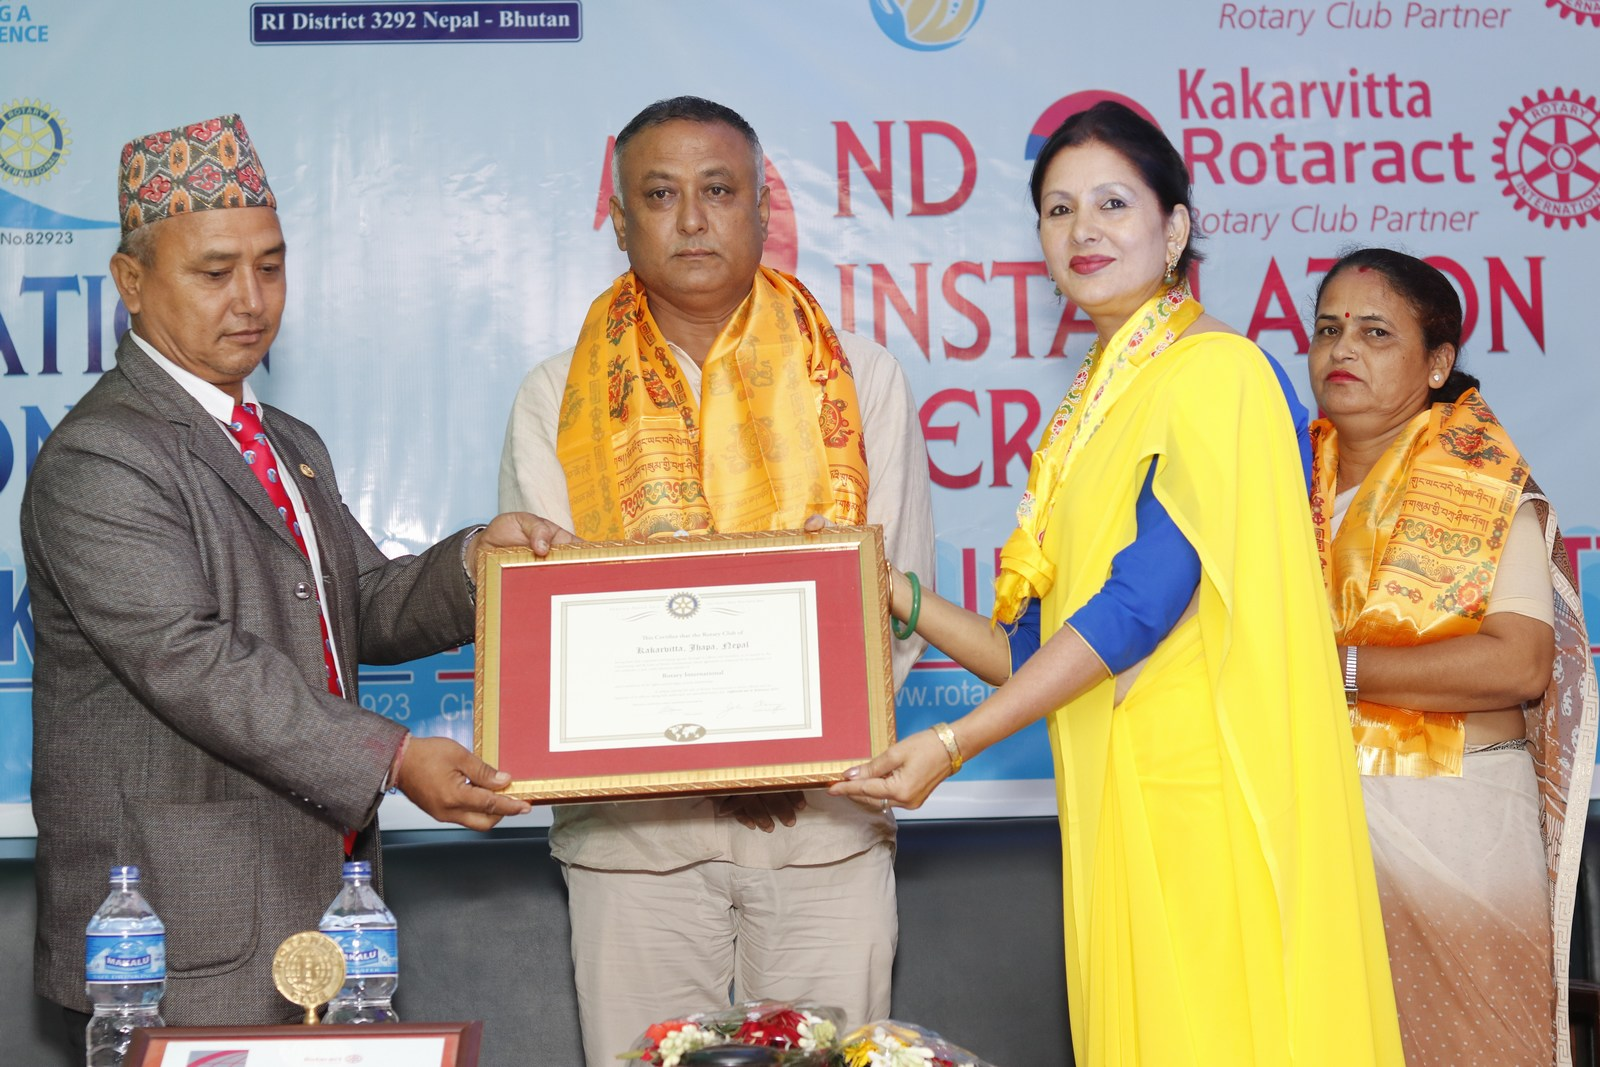 8th-Installation-Ceremony-Rotary-Club-of-Kakarvitta-33